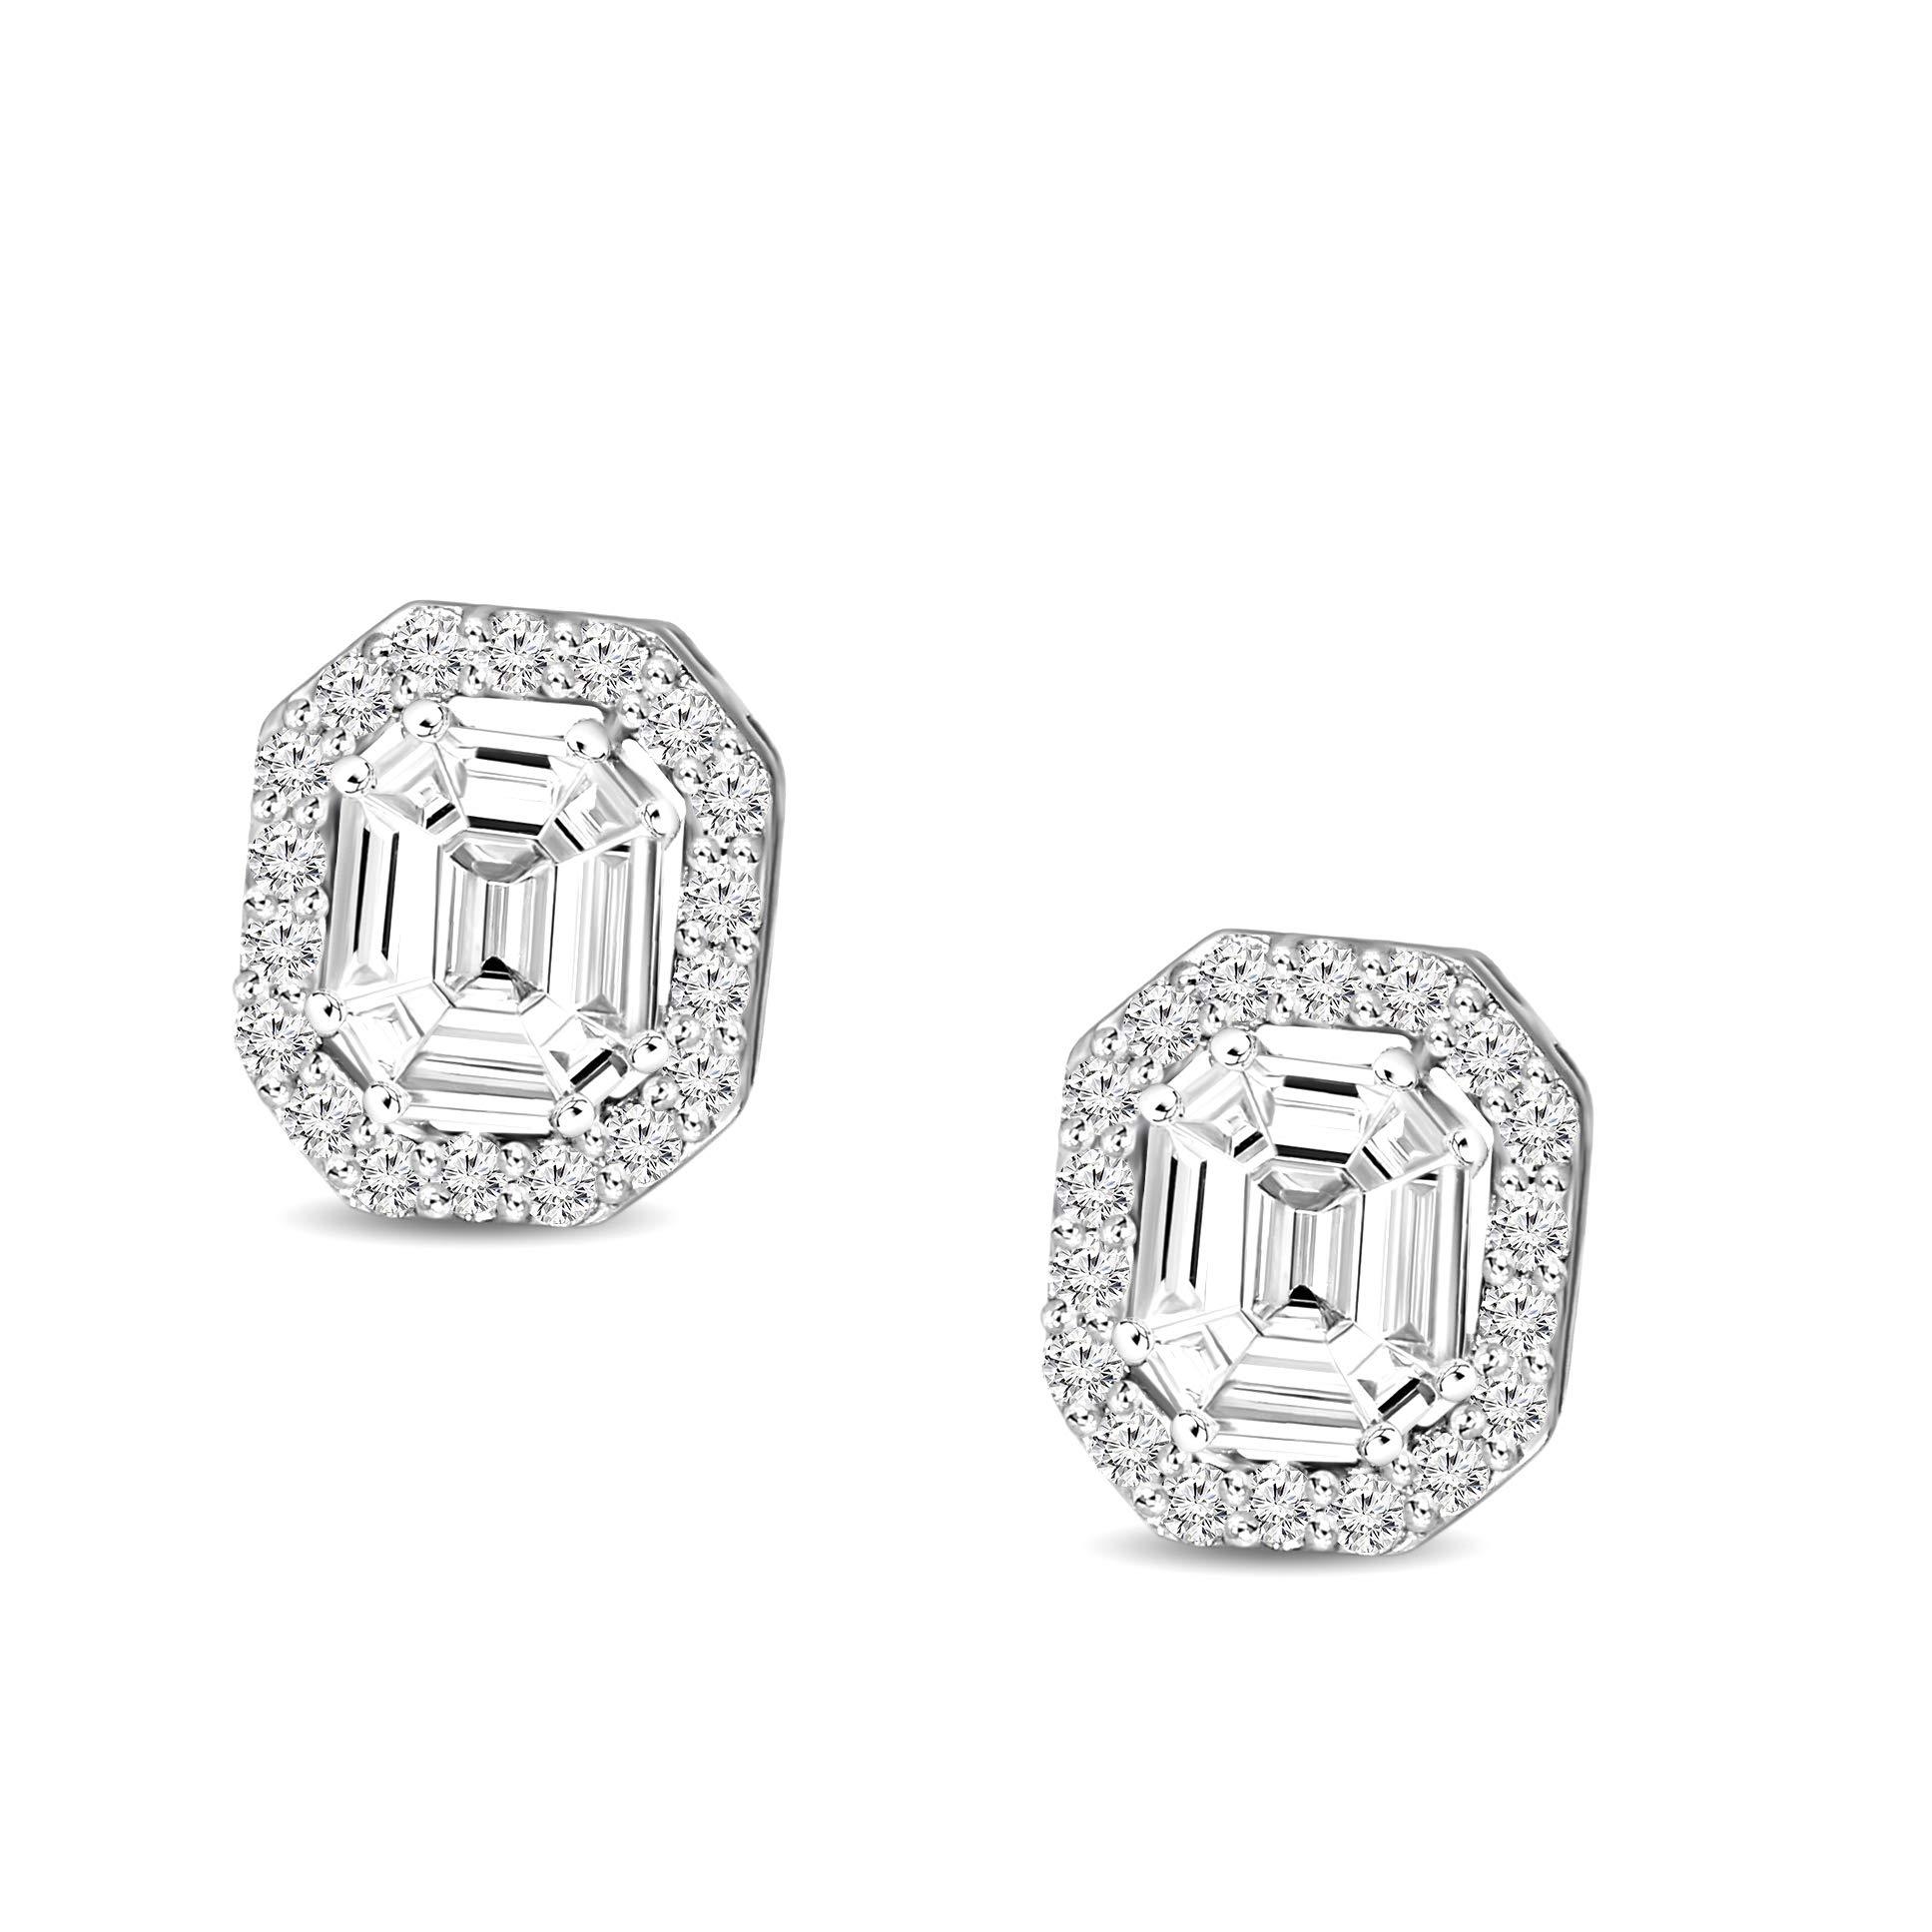 Natural Diamond Earrings IGI Certified 1/2 cttw Diamond Earrings For Women Emerald Shape Diamond Stud Earring SI-GH Quality 14K Real Diamond Pie Cut Halo For Women